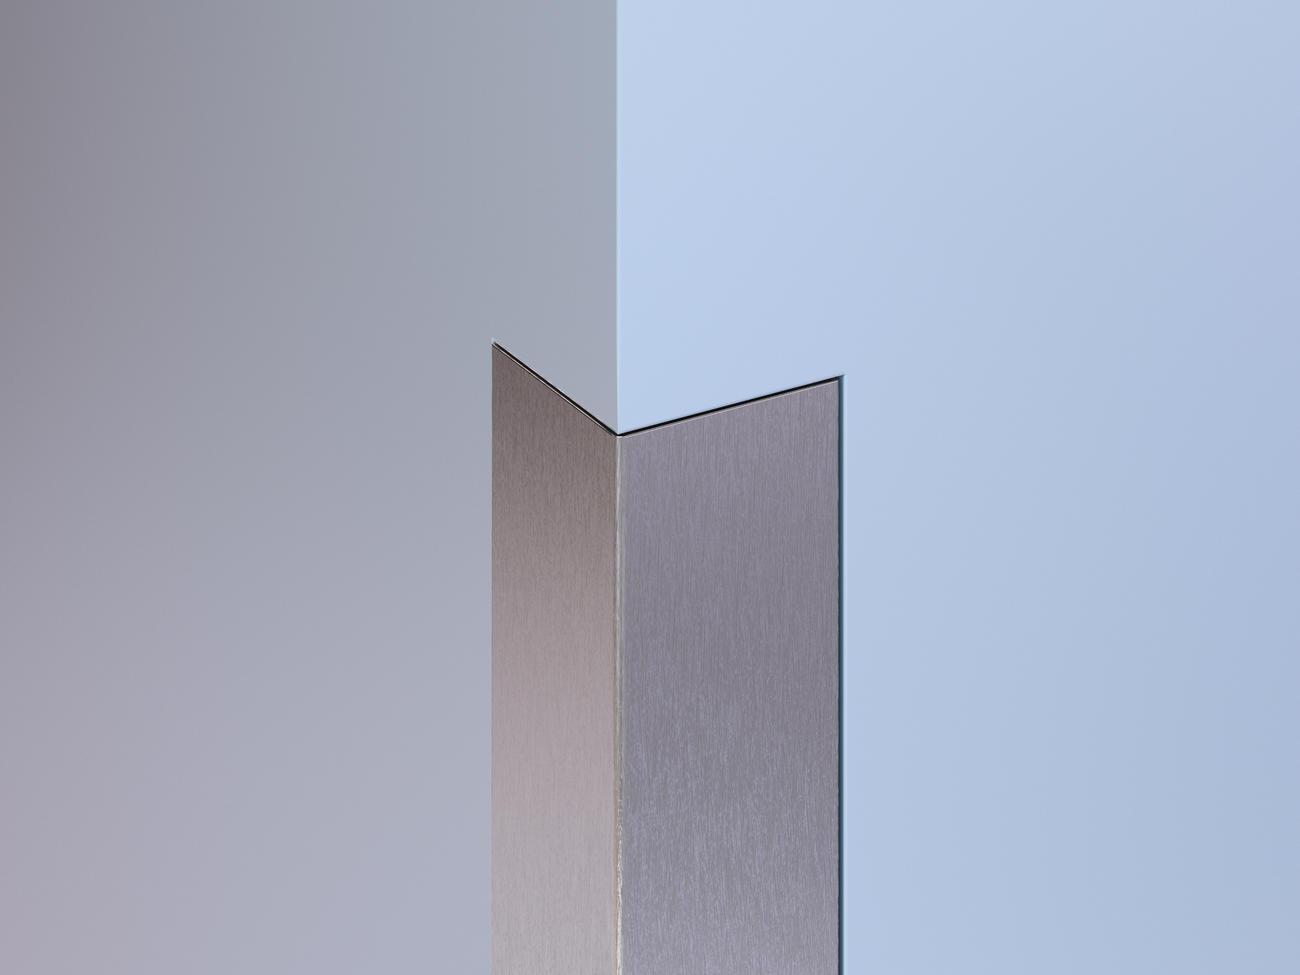 Flush-Mount Stainless Steel Corner Guards